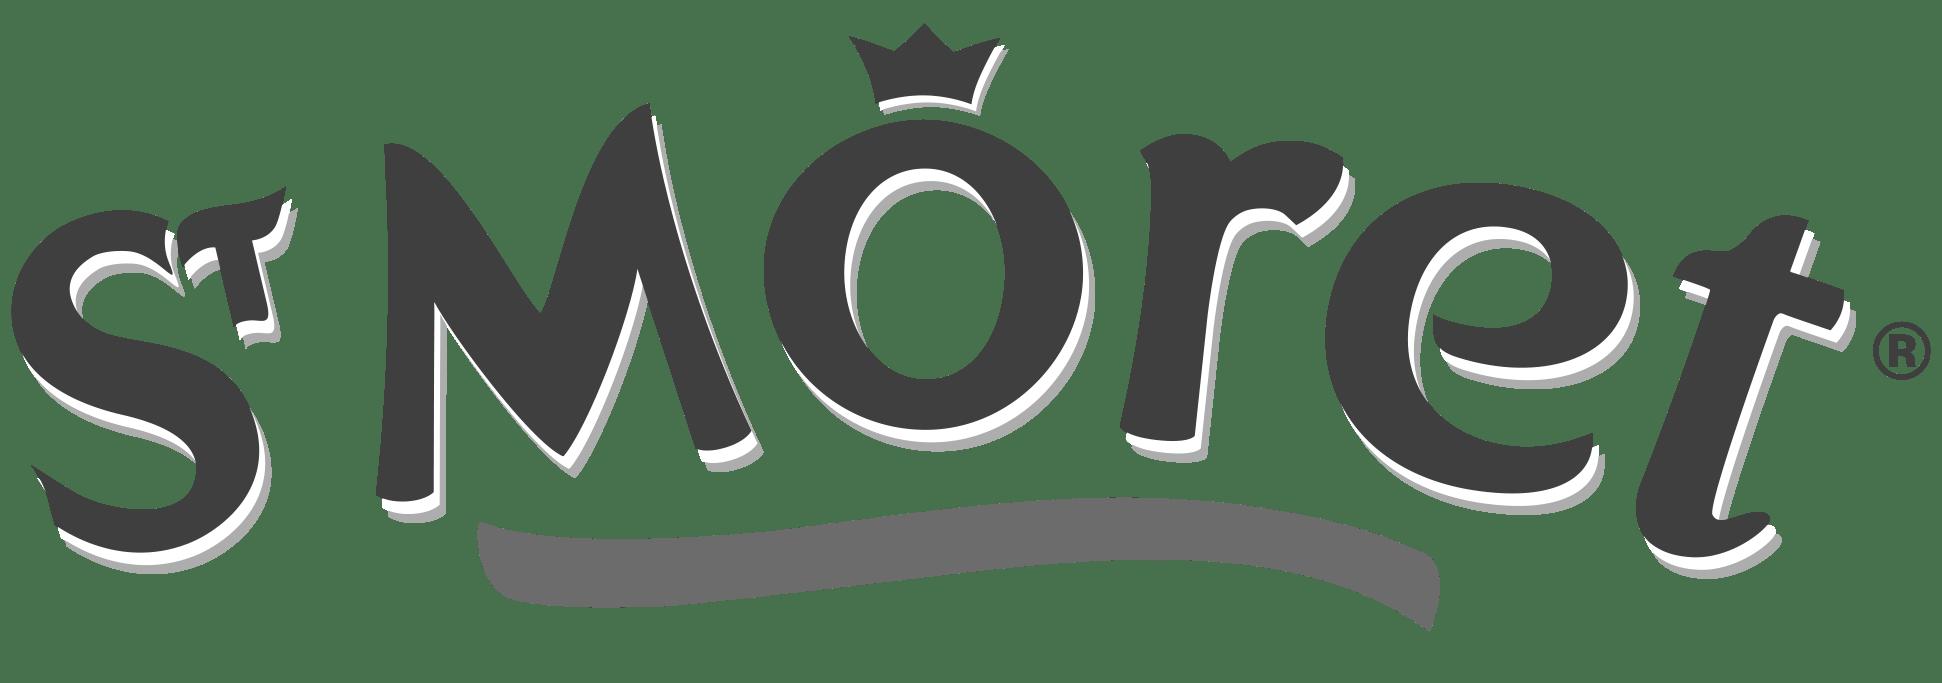 agence branding paris design- fromage St Moret